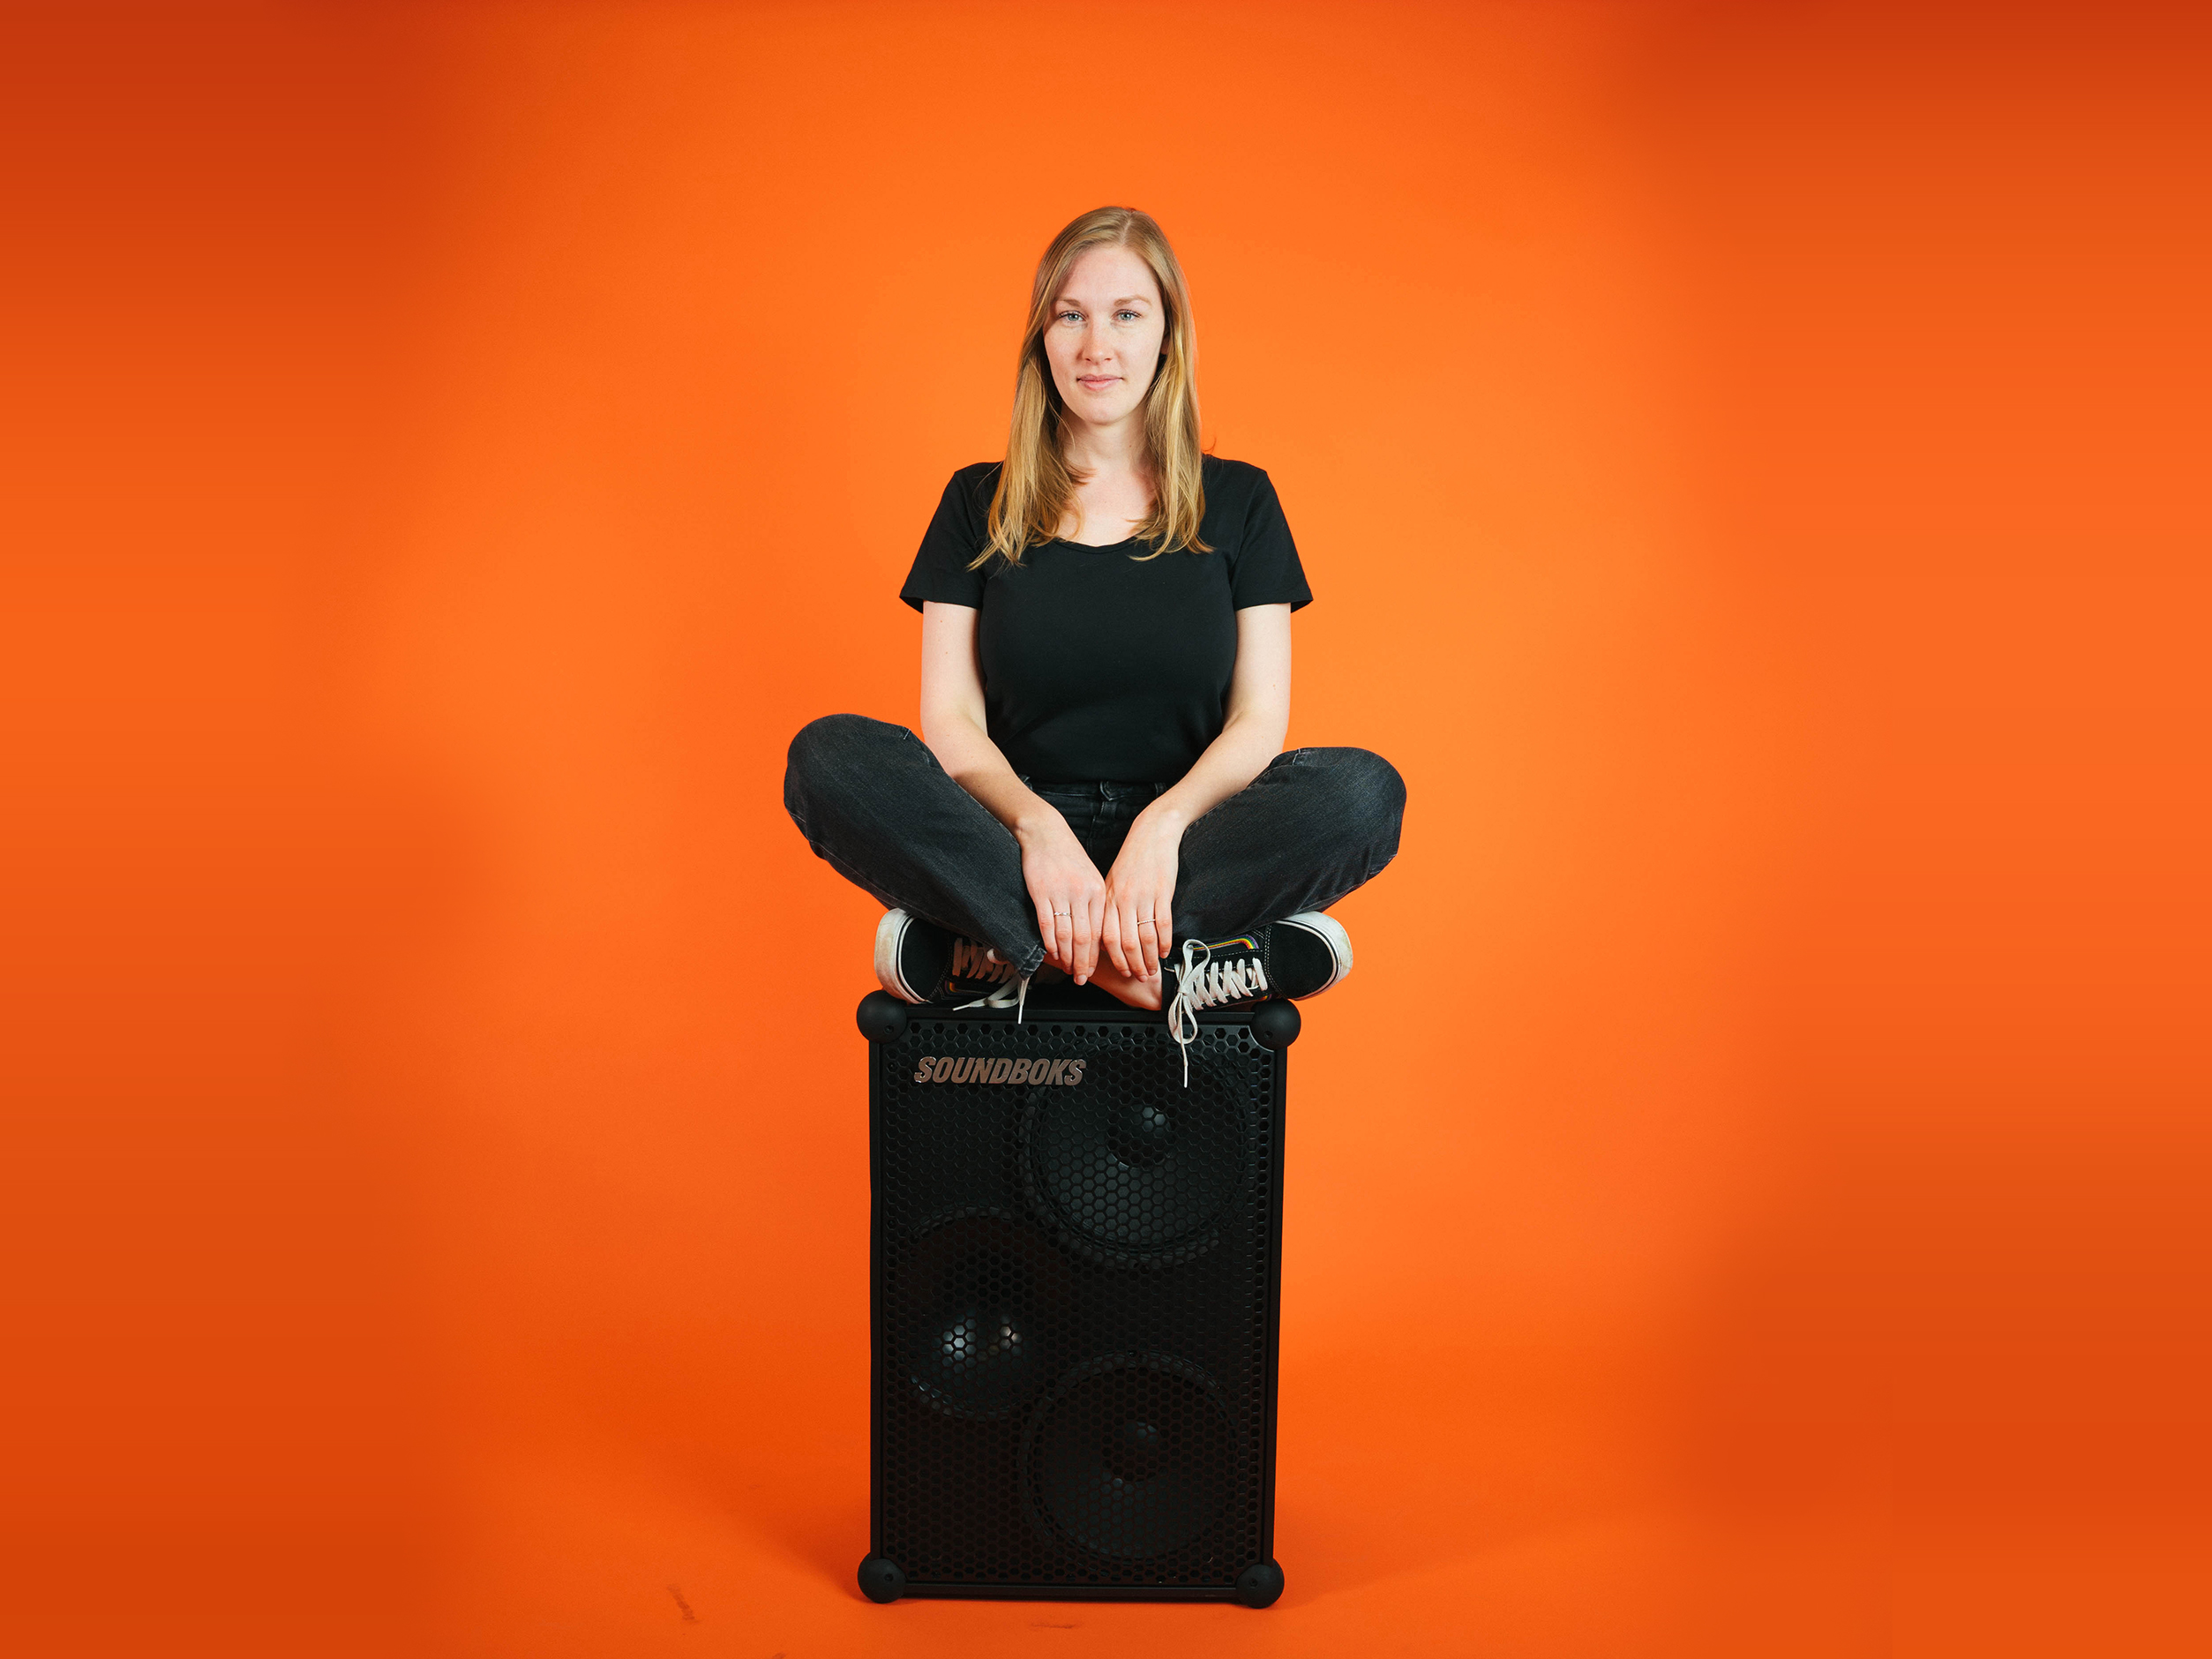 Michelle, a soundboks employee sitting on top of a soundboks in front of an orange background